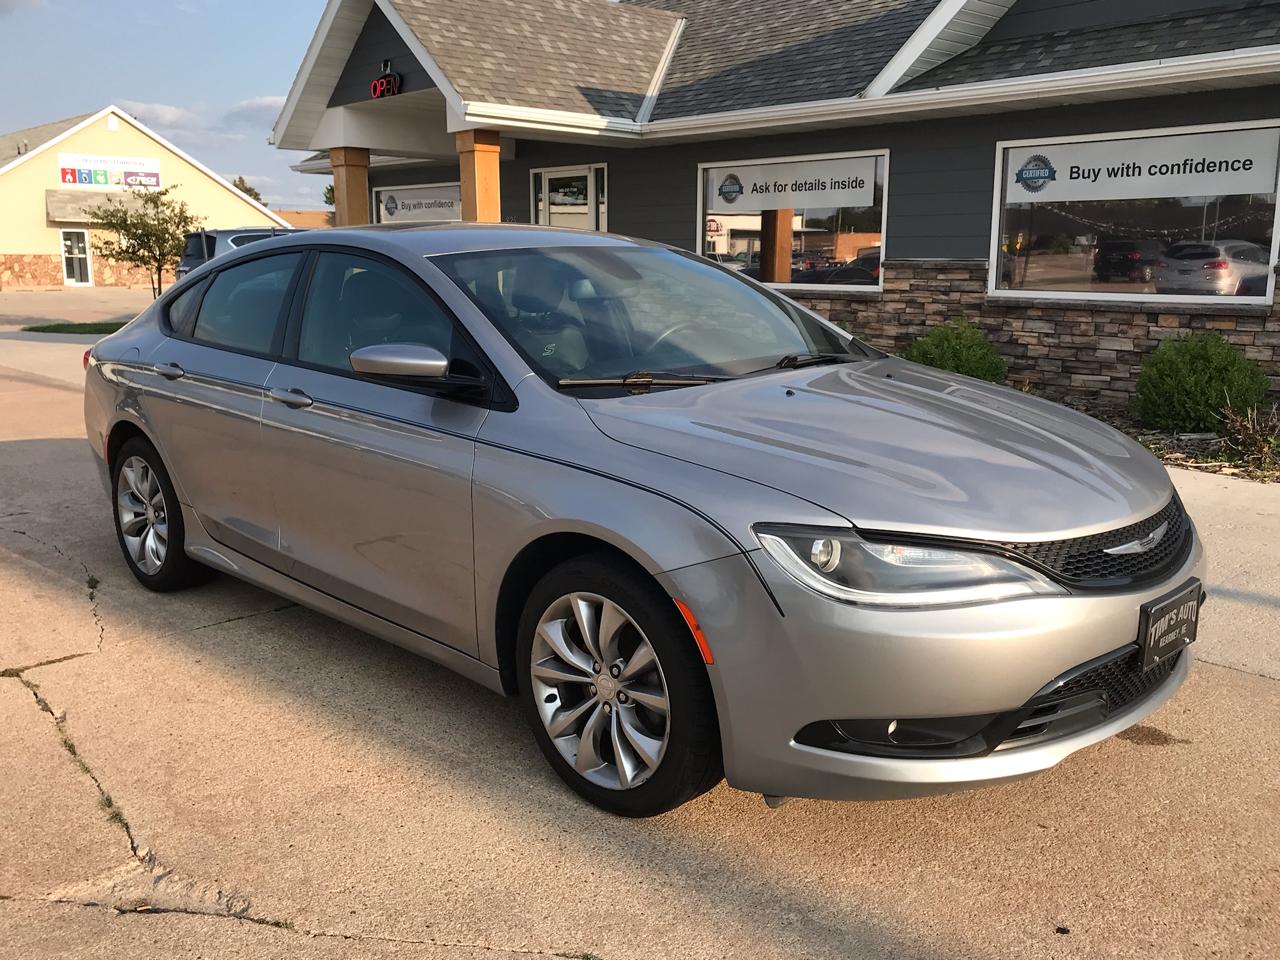 Chrysler 200 4dr Sdn S FWD 2016